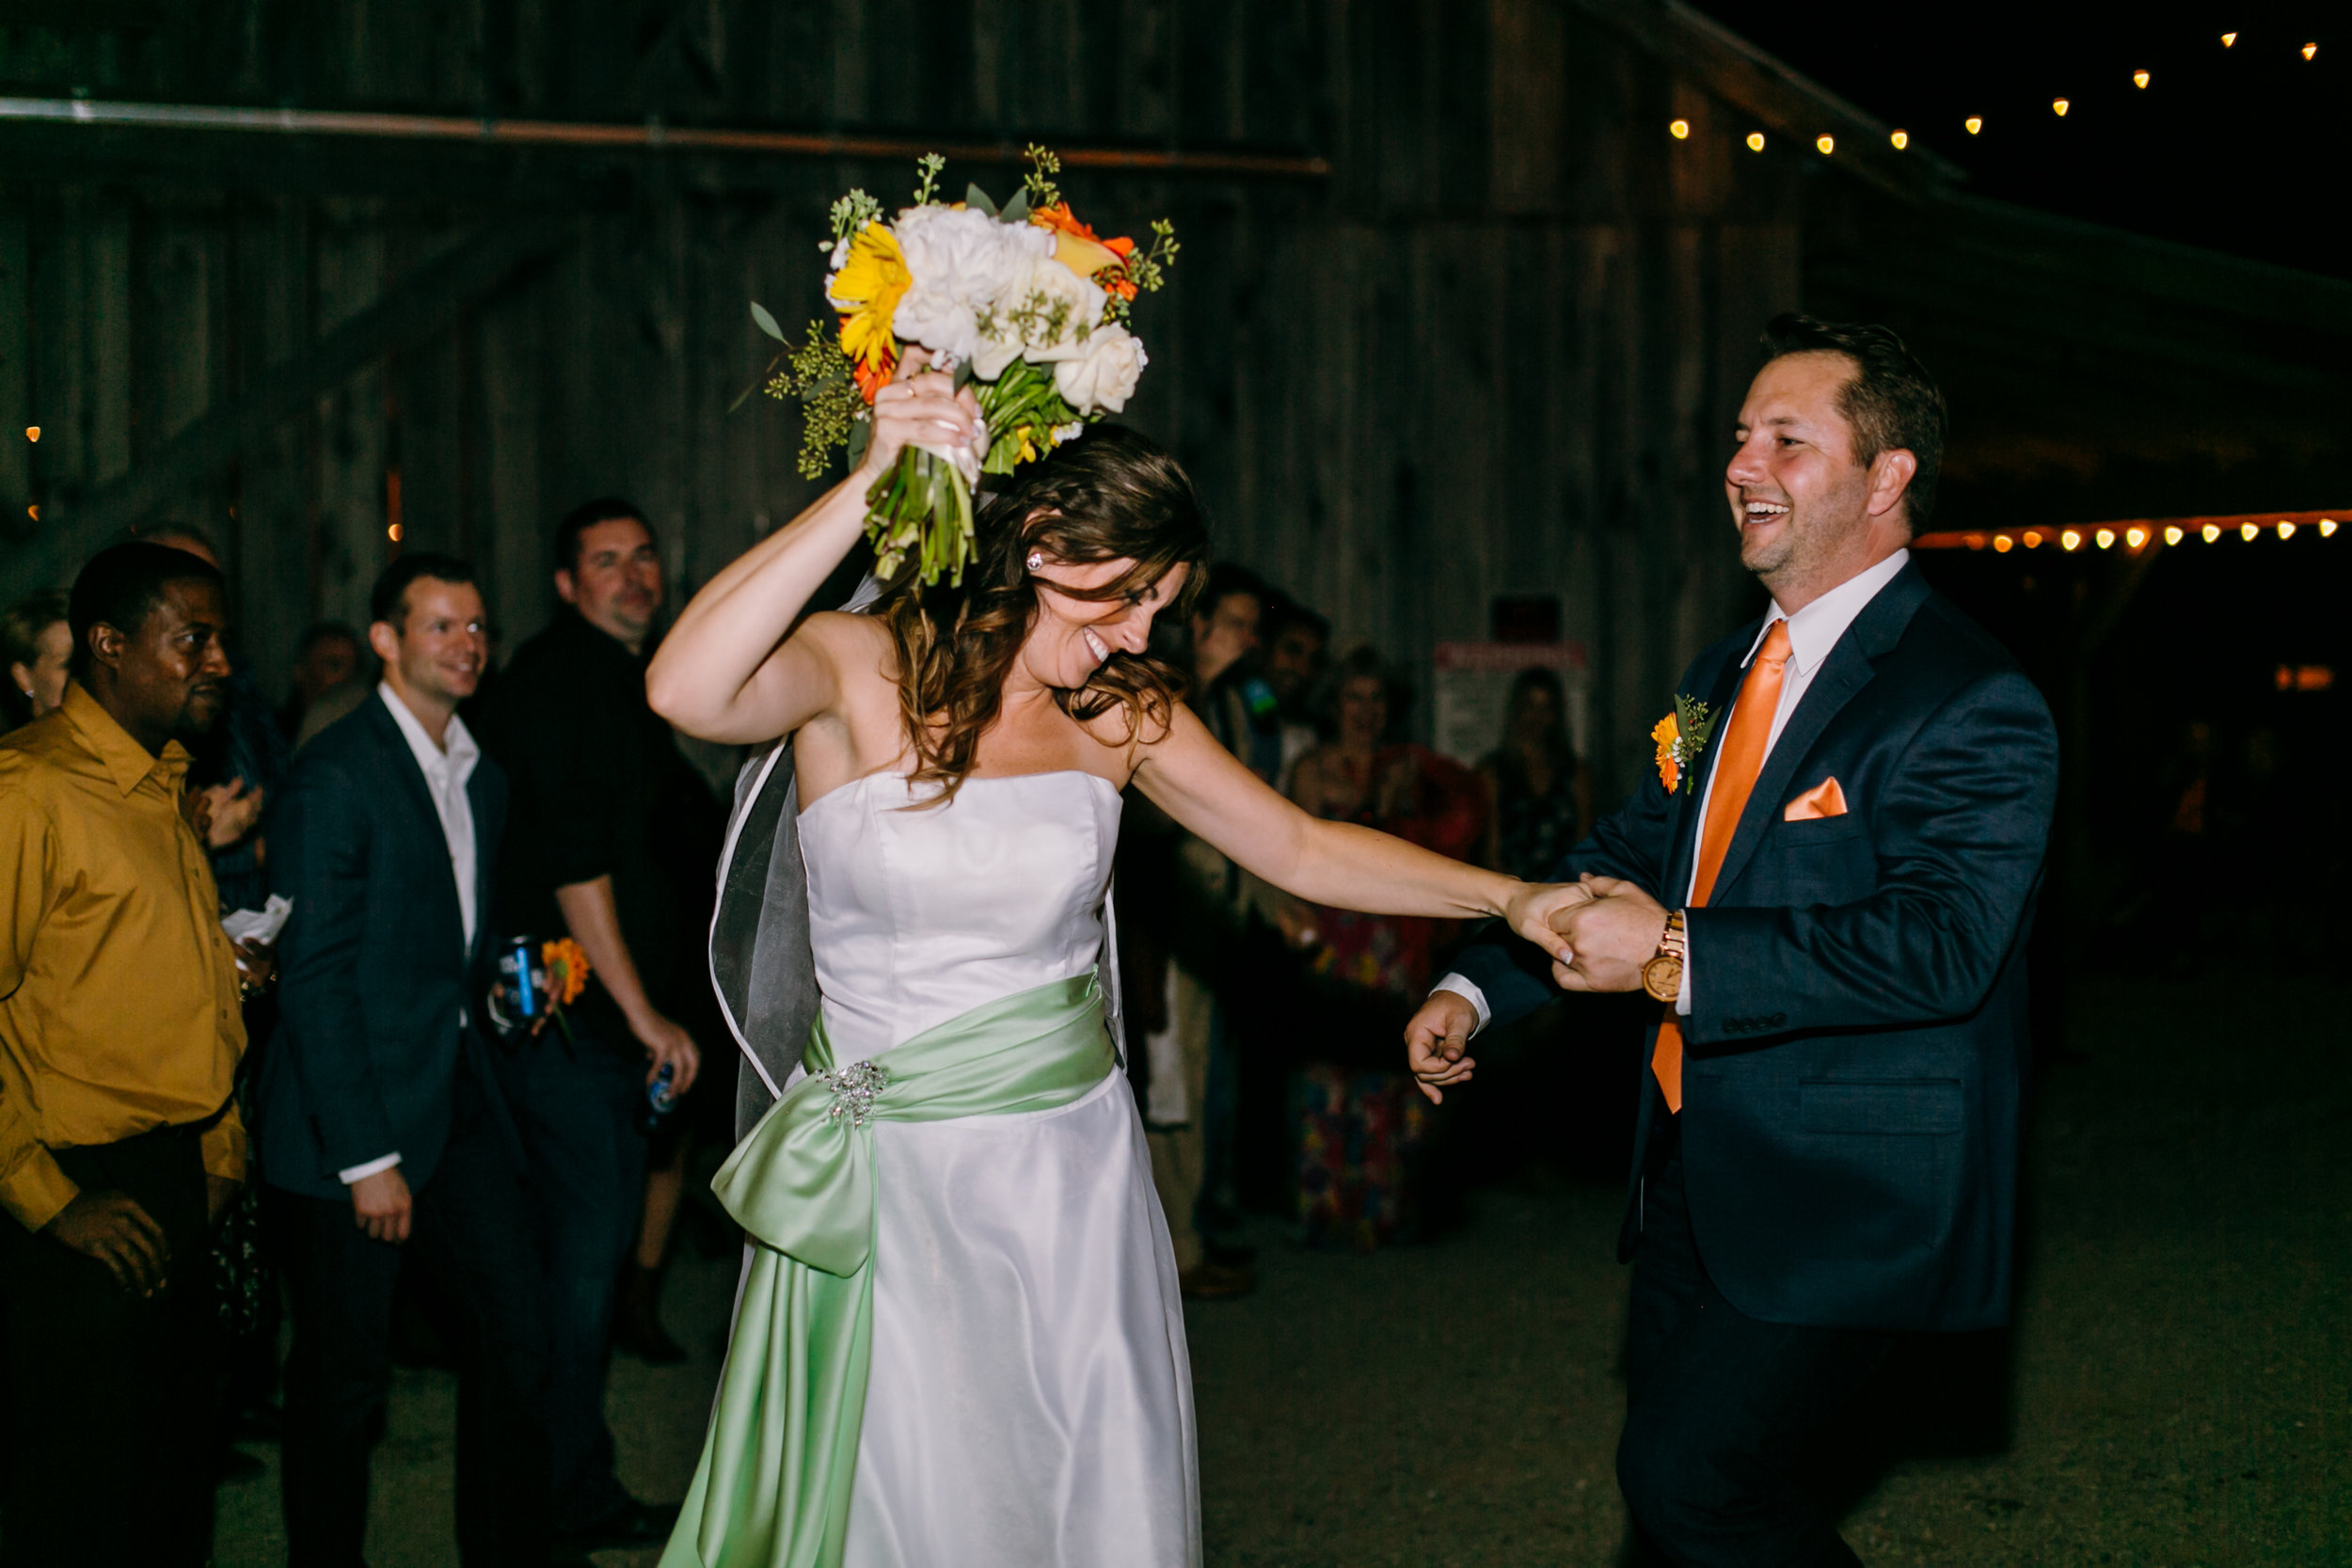 KaraNixonWeddings-Nashville-TN-Wedding-109.jpg